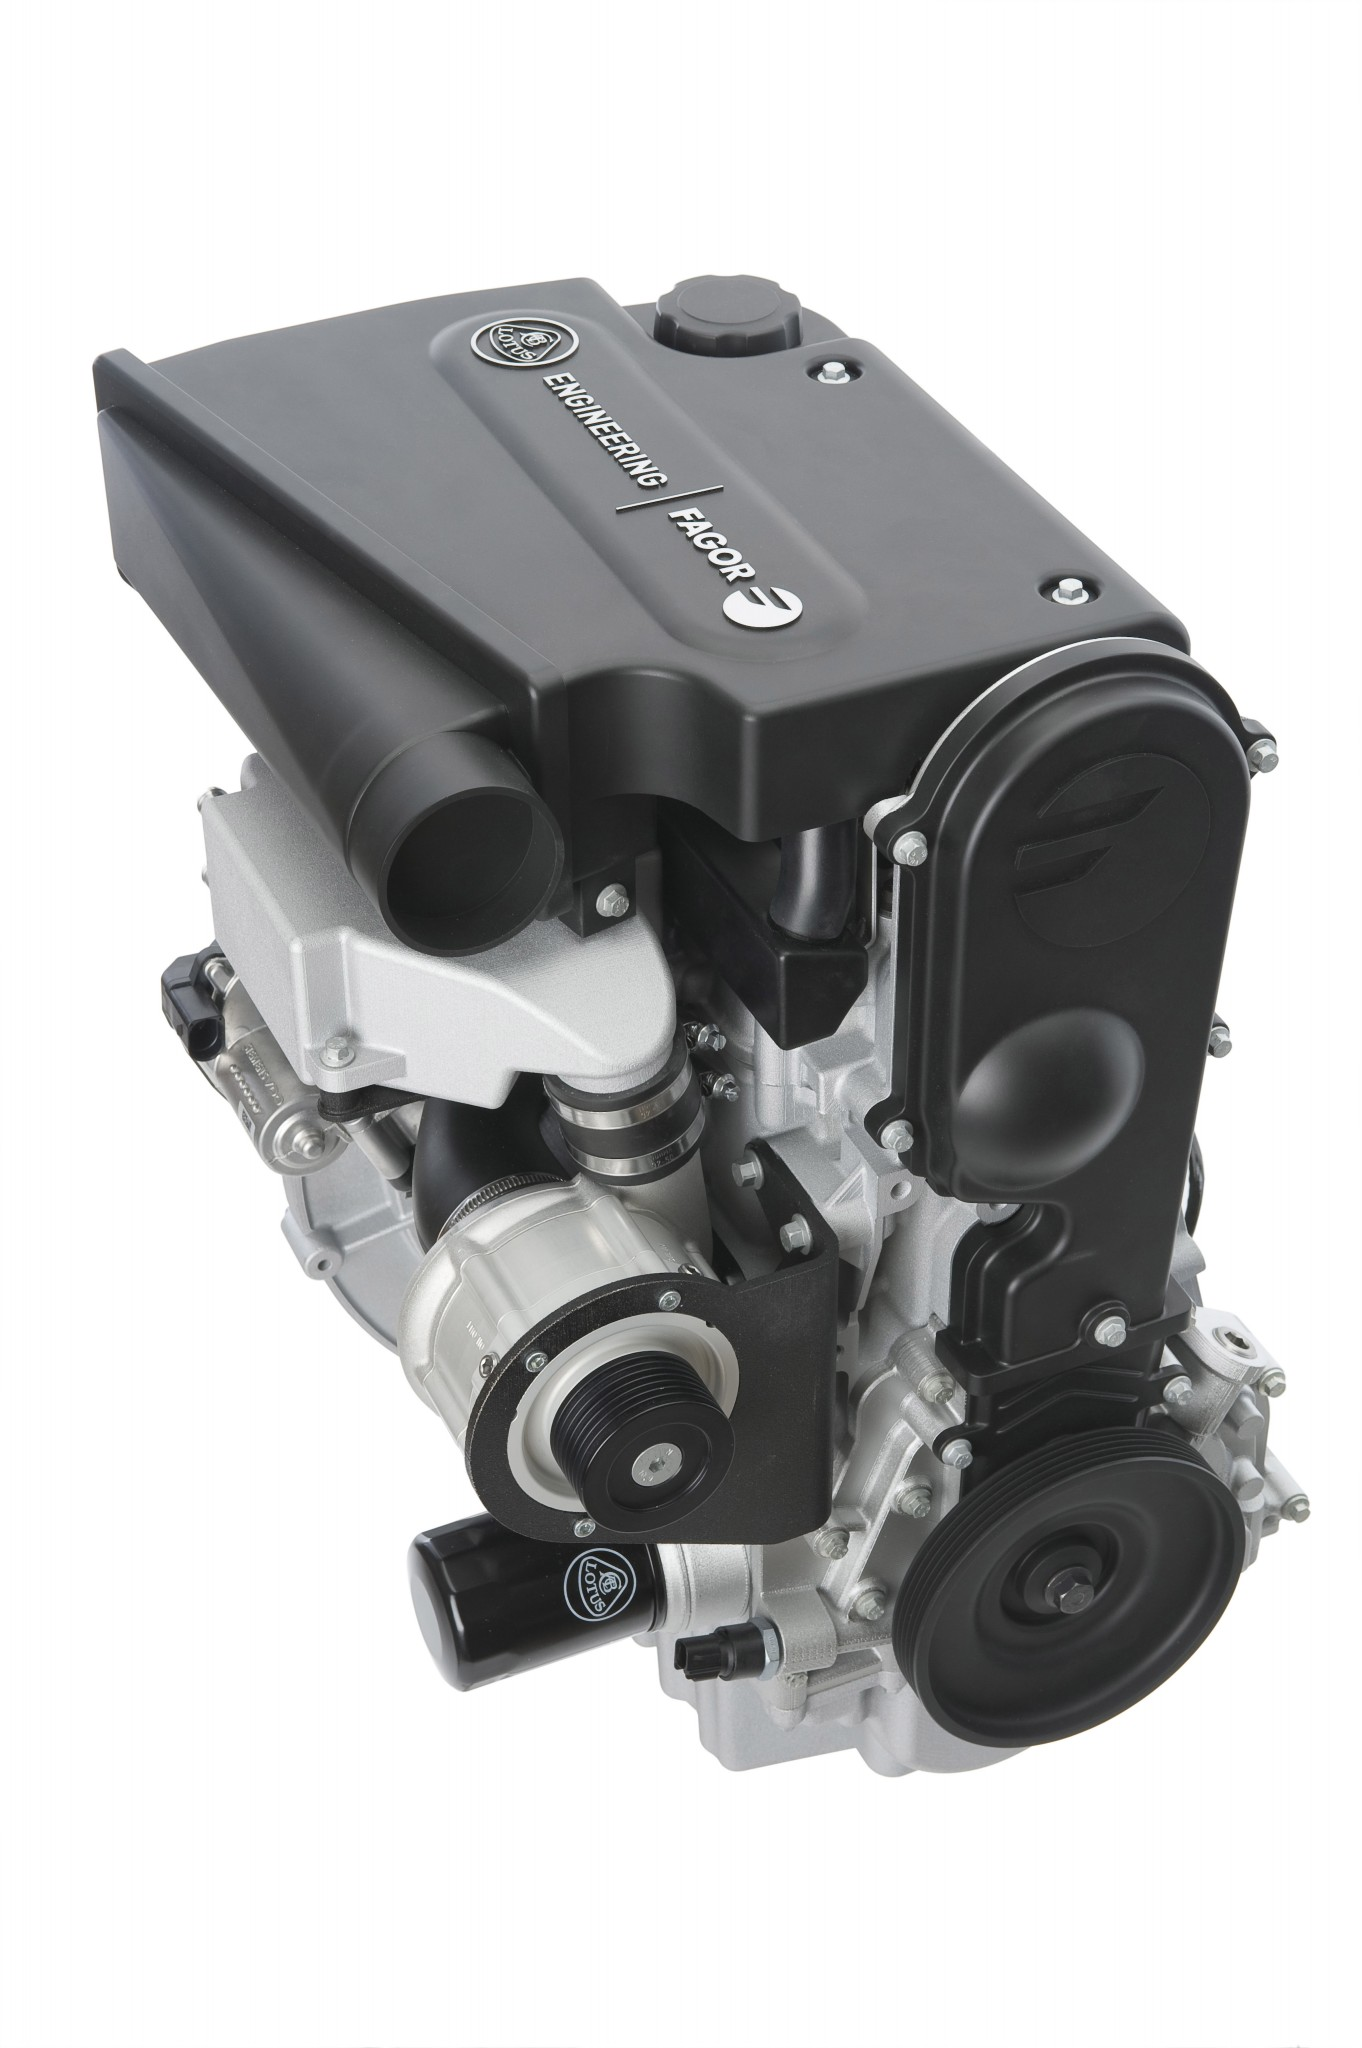 Flex Fuel Cars >> Lotus Cars – Lotus Engineering / Fagor Ederlan Supercharged Production 3-Cylinder Range Extender ...